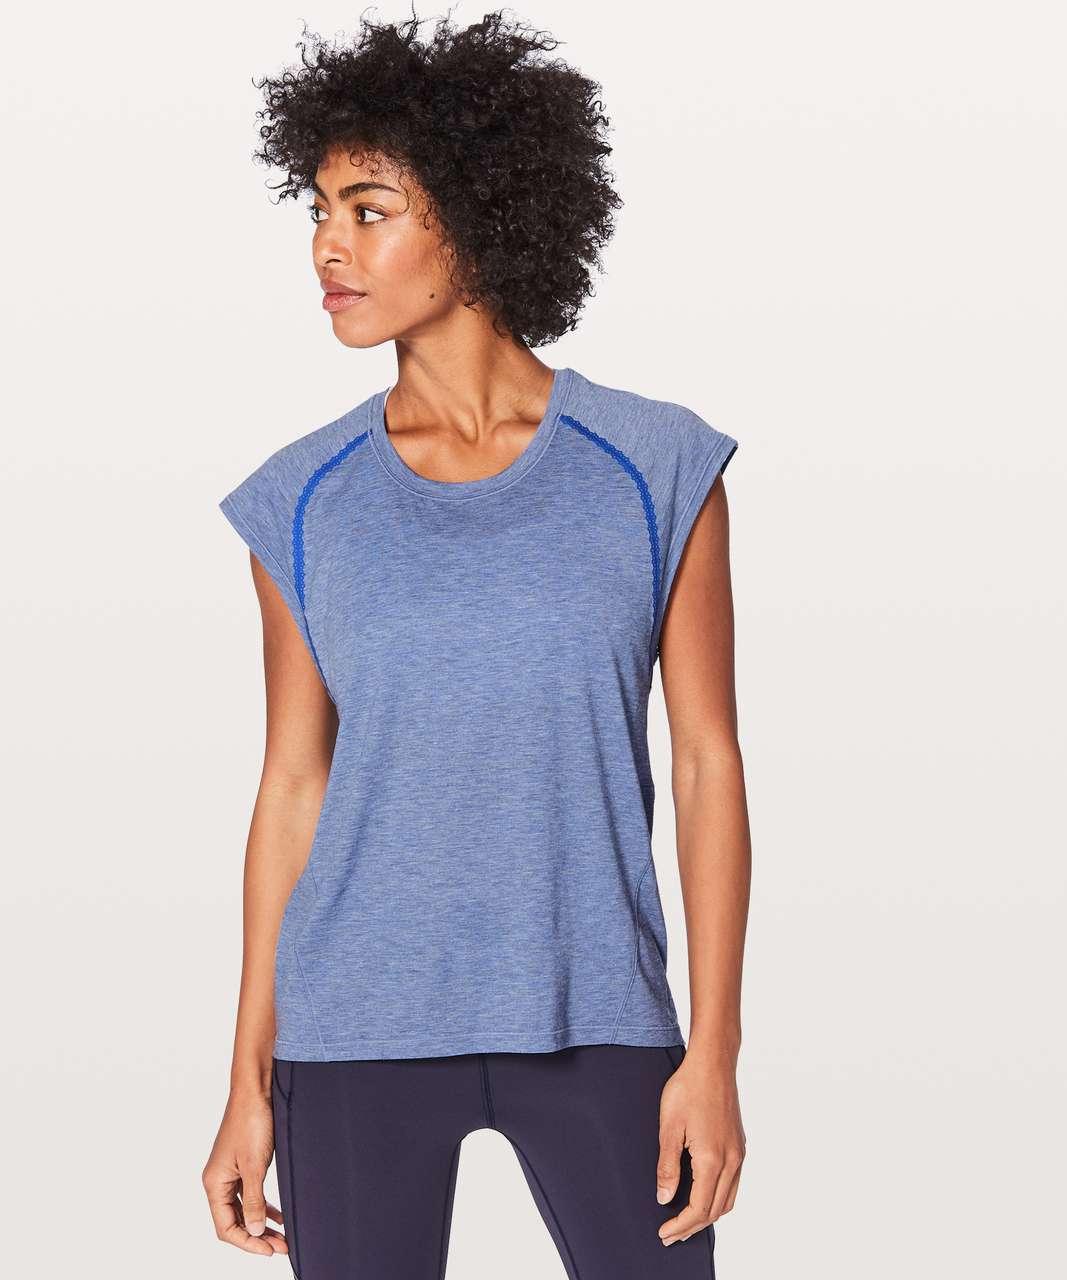 Lululemon Stop Drop & Squat Short Sleeve - Heathered Blazer Blue